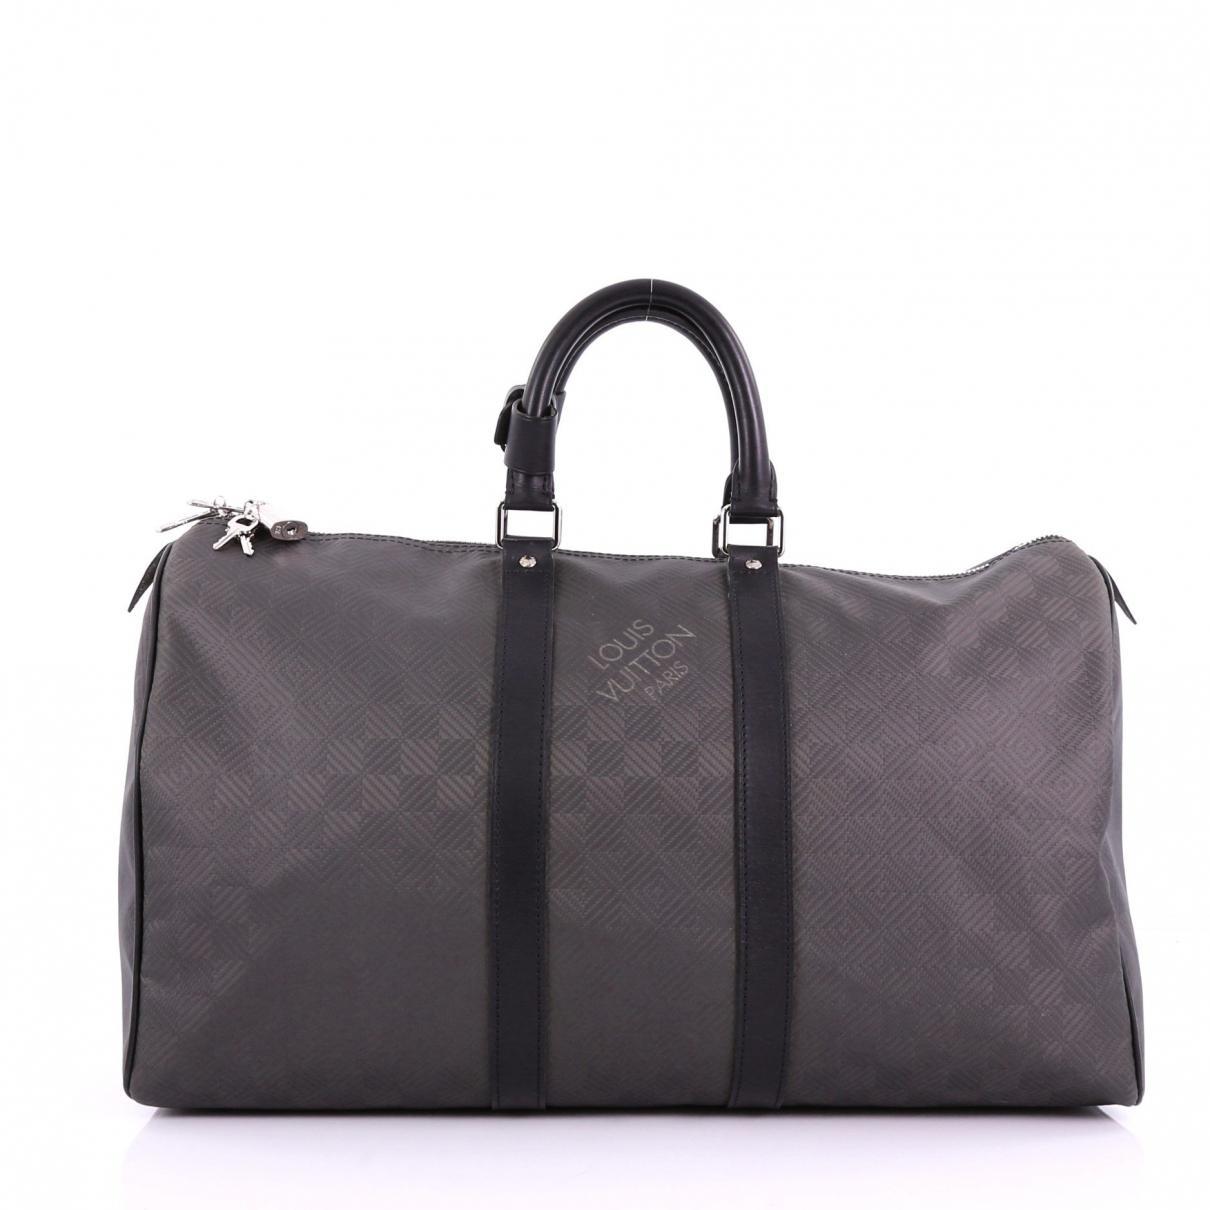 Lyst - Louis Vuitton Keepall Cloth Travel Bag in Gray for Men db0301447201b